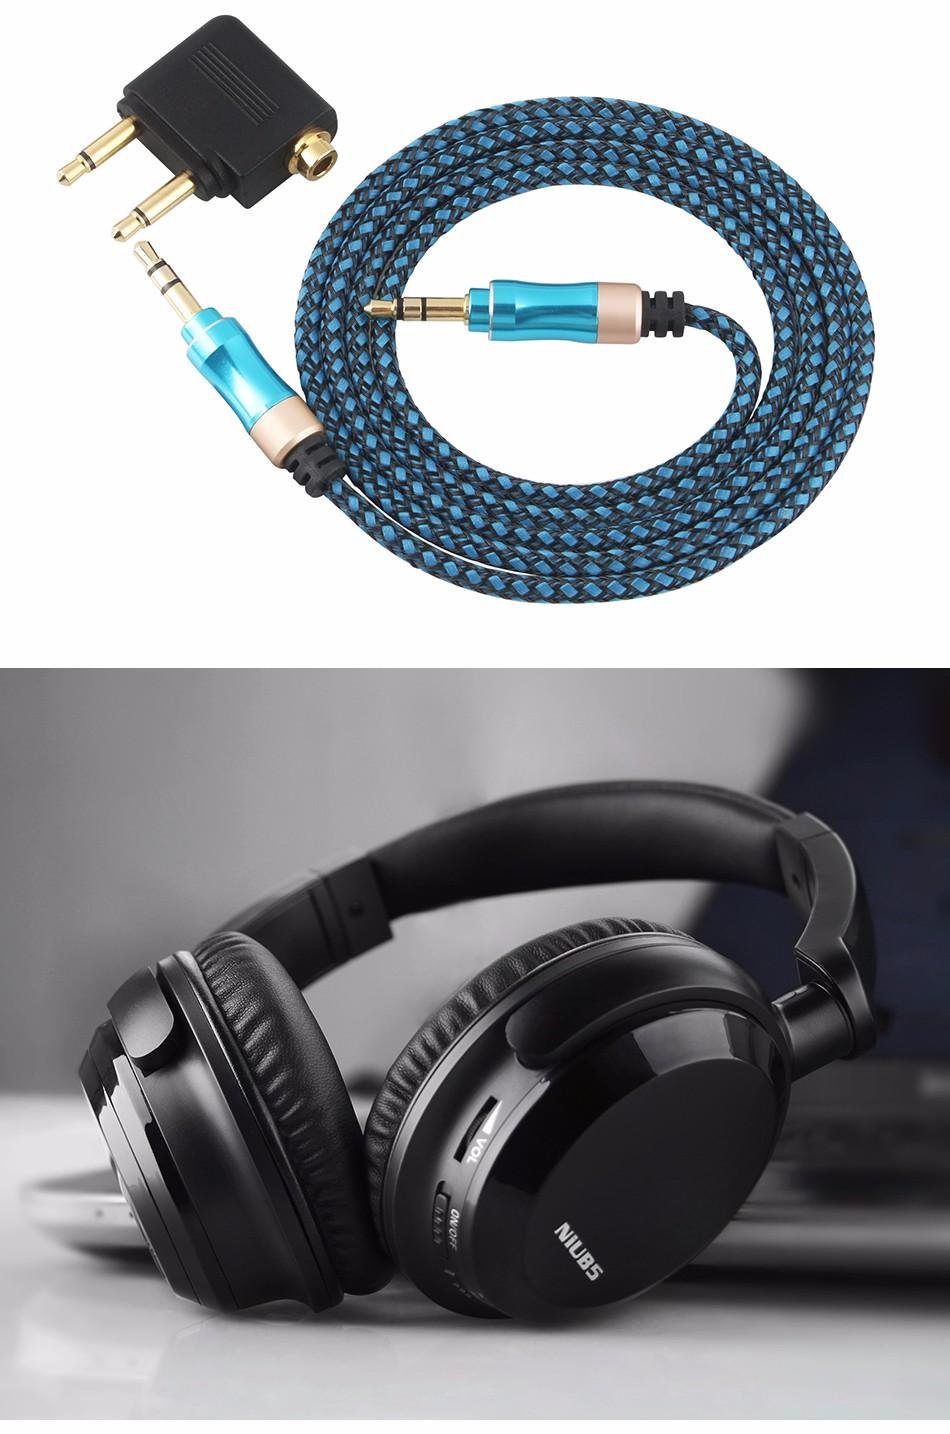 Headphones for phone